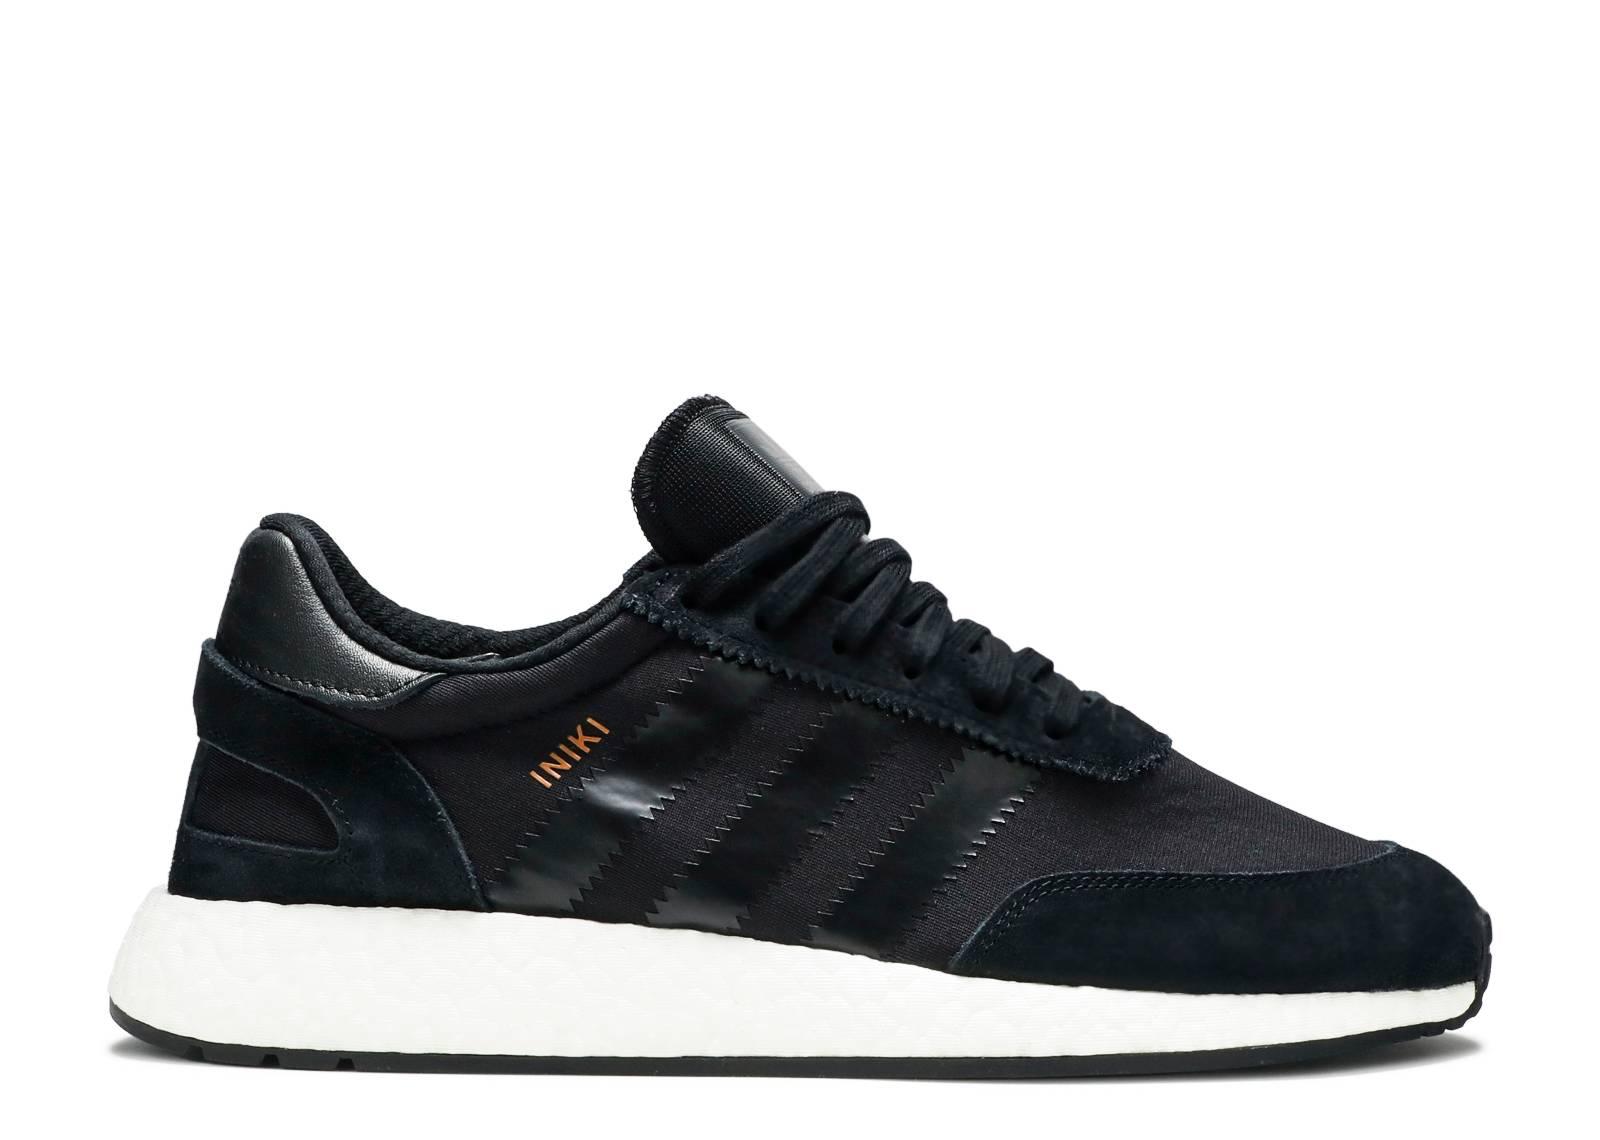 f3403fedbe67 Iniki Runner - Adidas - by9730 - black white